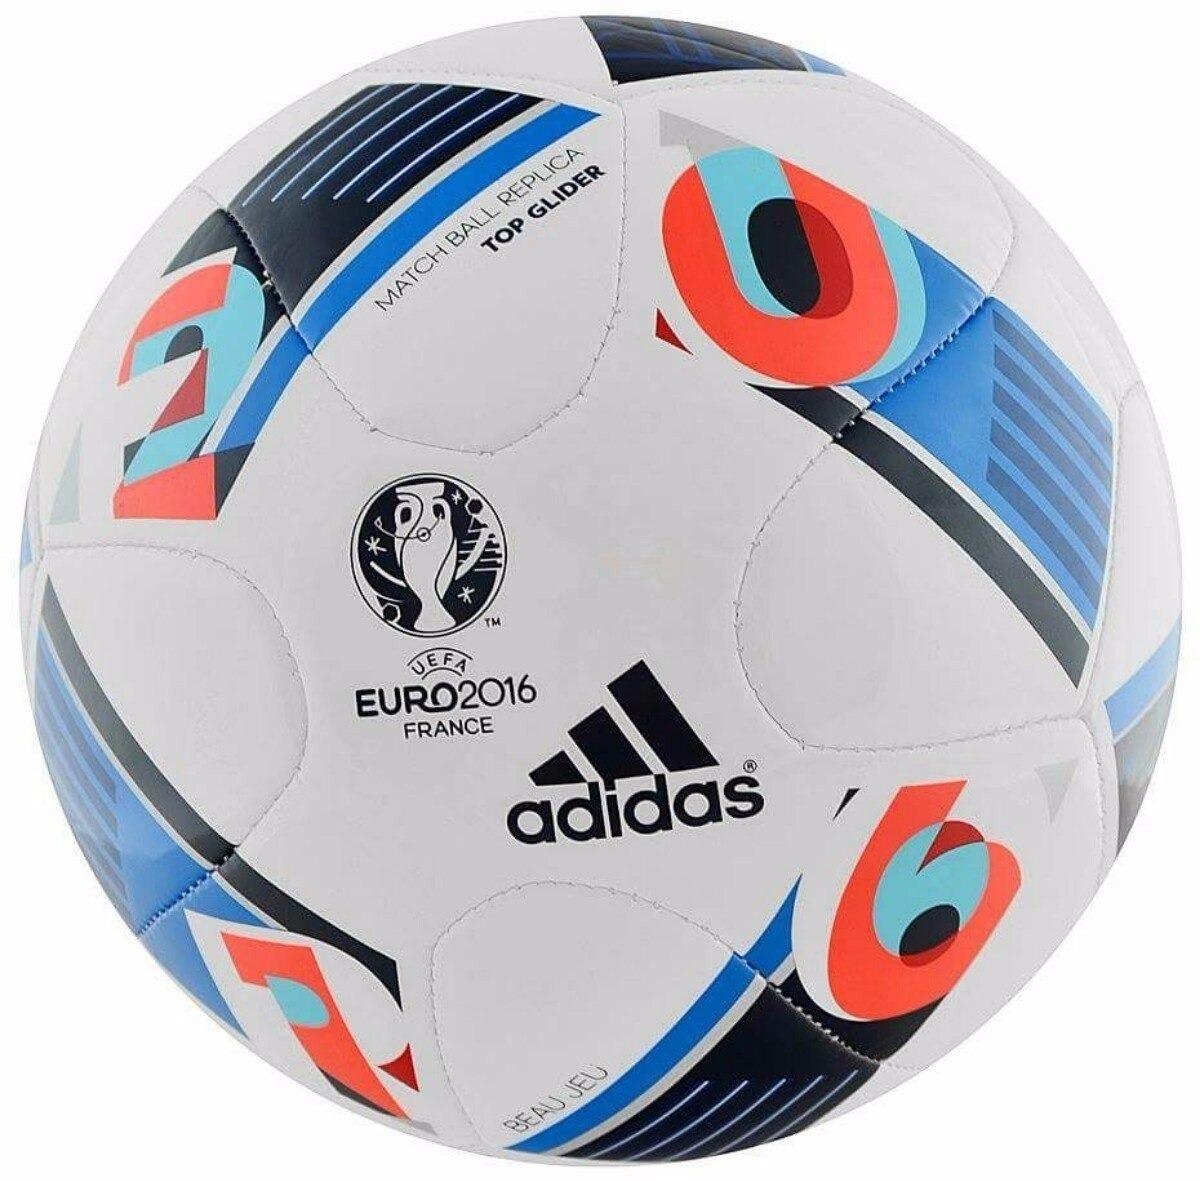 4ffdc622a8930 balon futbol número 5 oficial adidas original. Cargando zoom.